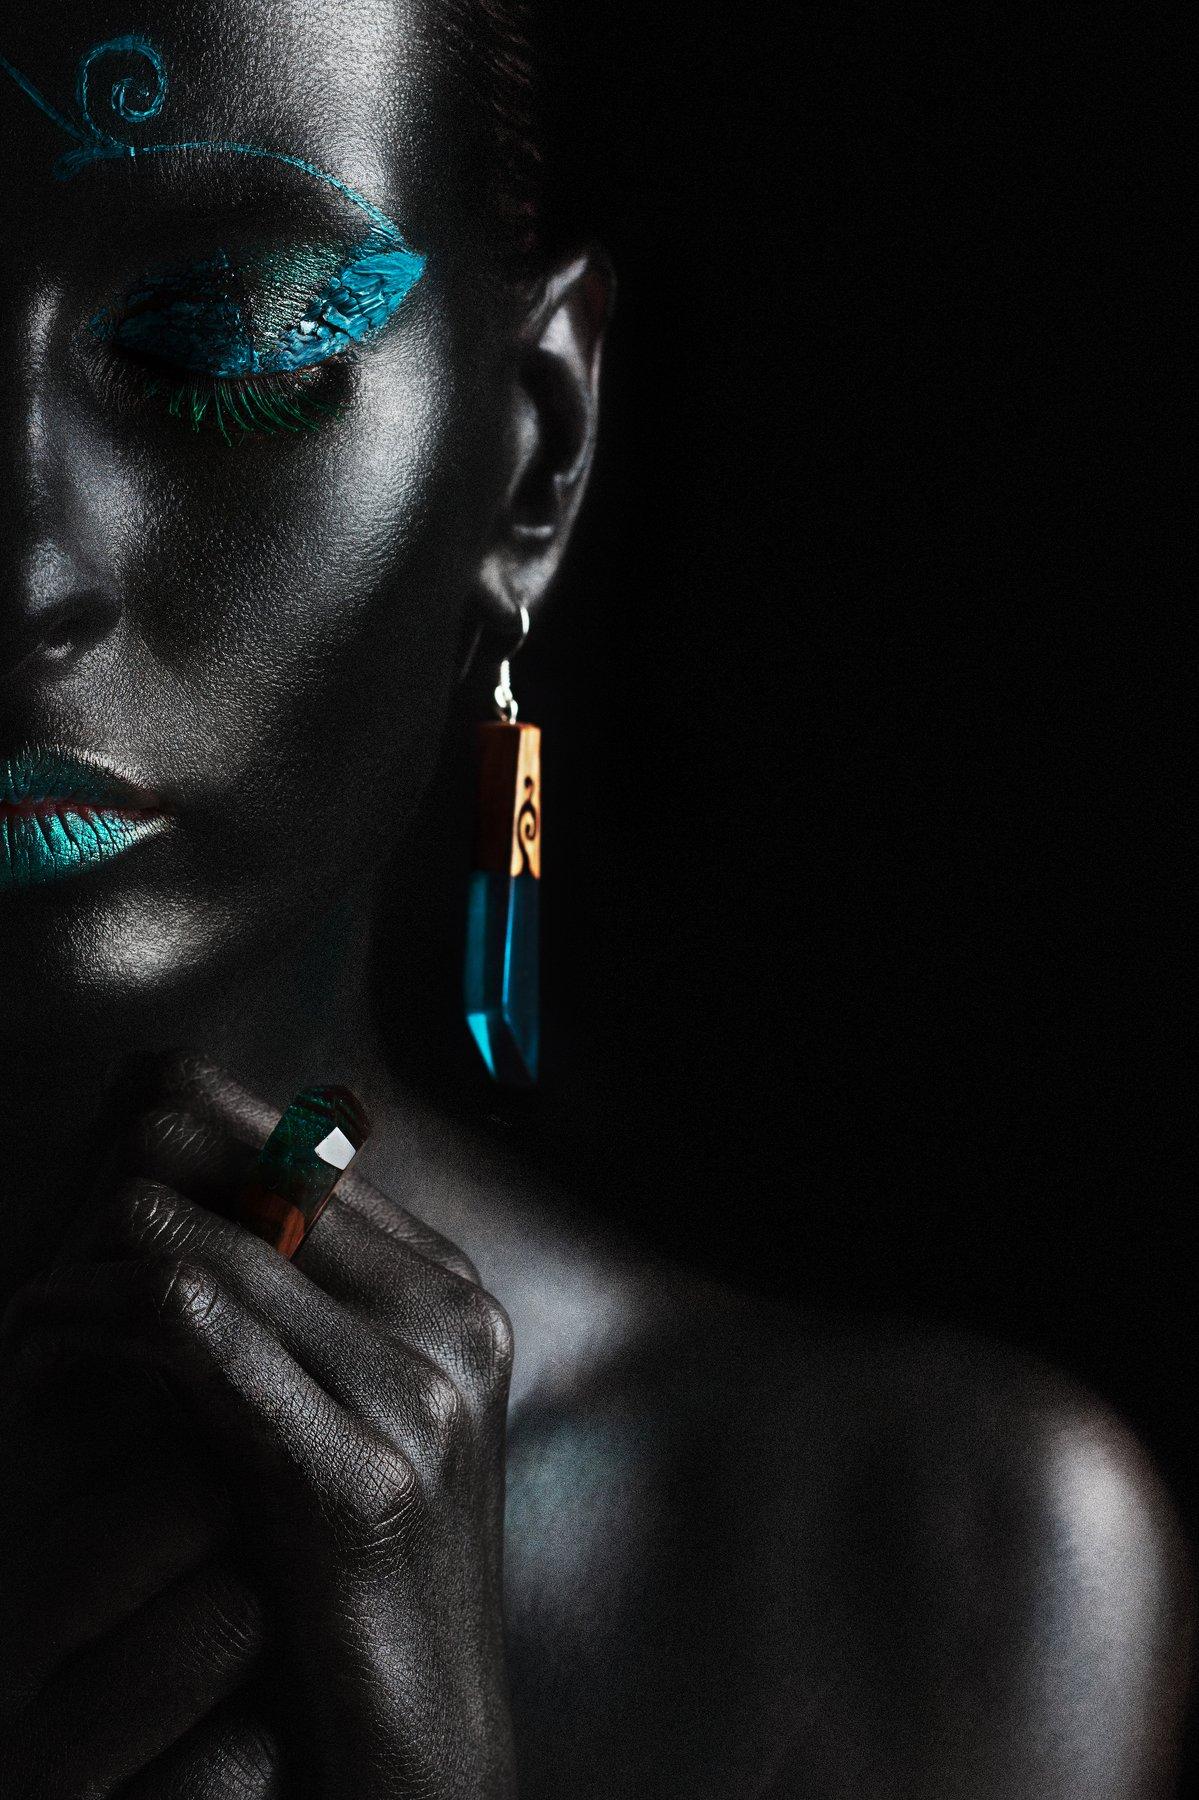 people, girl, portrait, art, body, soul, stones, texture, relief, eye, neck, paint, makeup, body art, forever, opinion, creative, Ковалёв Иван